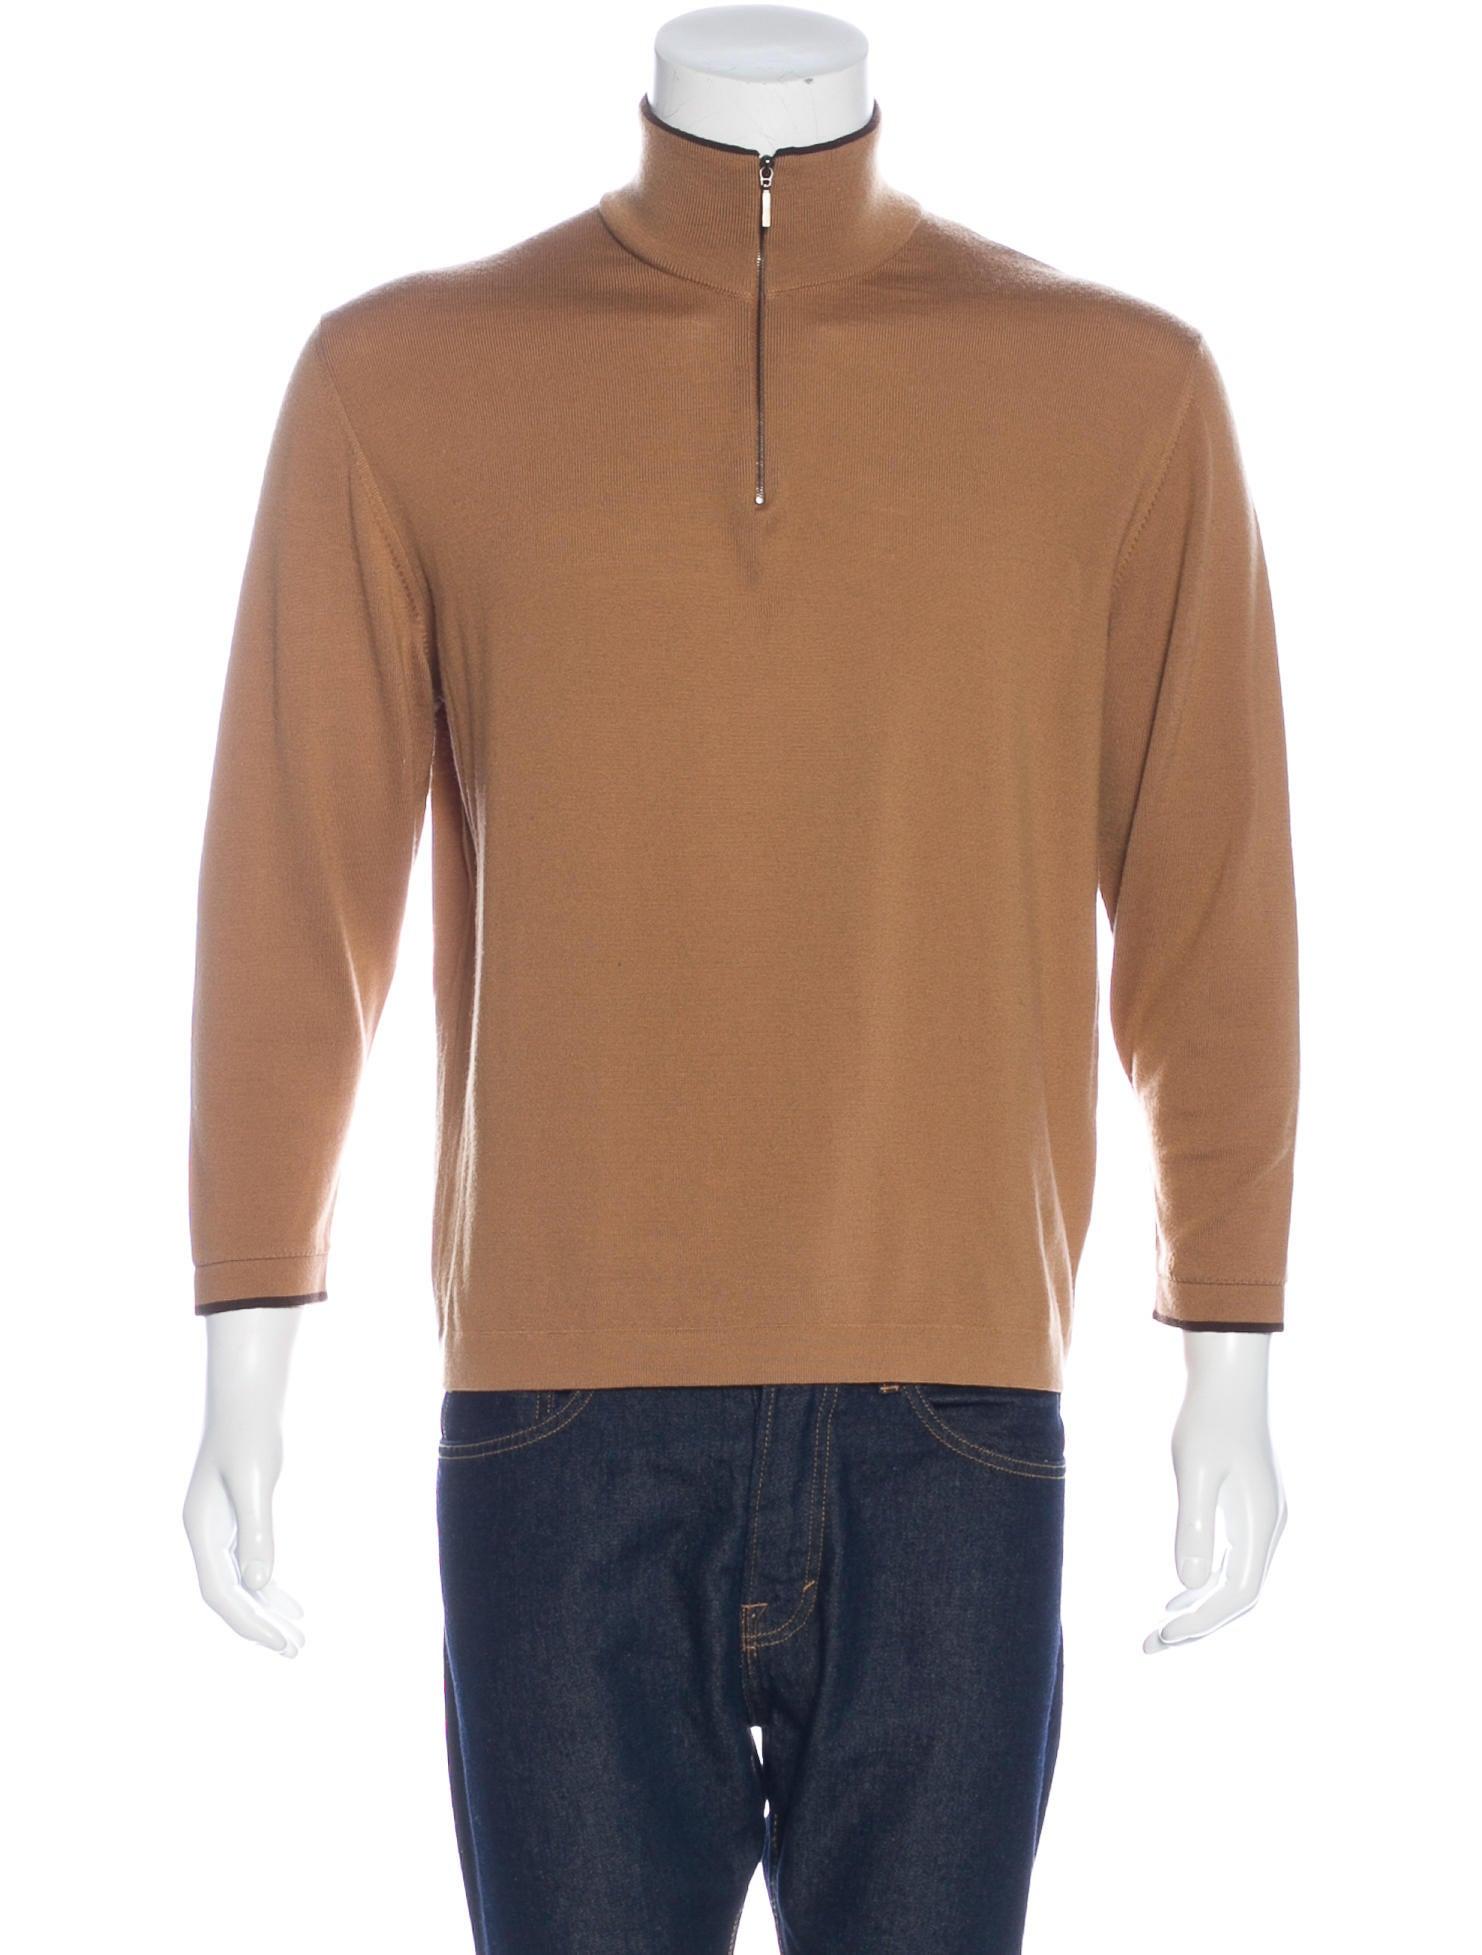 Ermenegildo Zegna Wool Half-Zip Sweater - Clothing - ZGN24810 | The RealReal